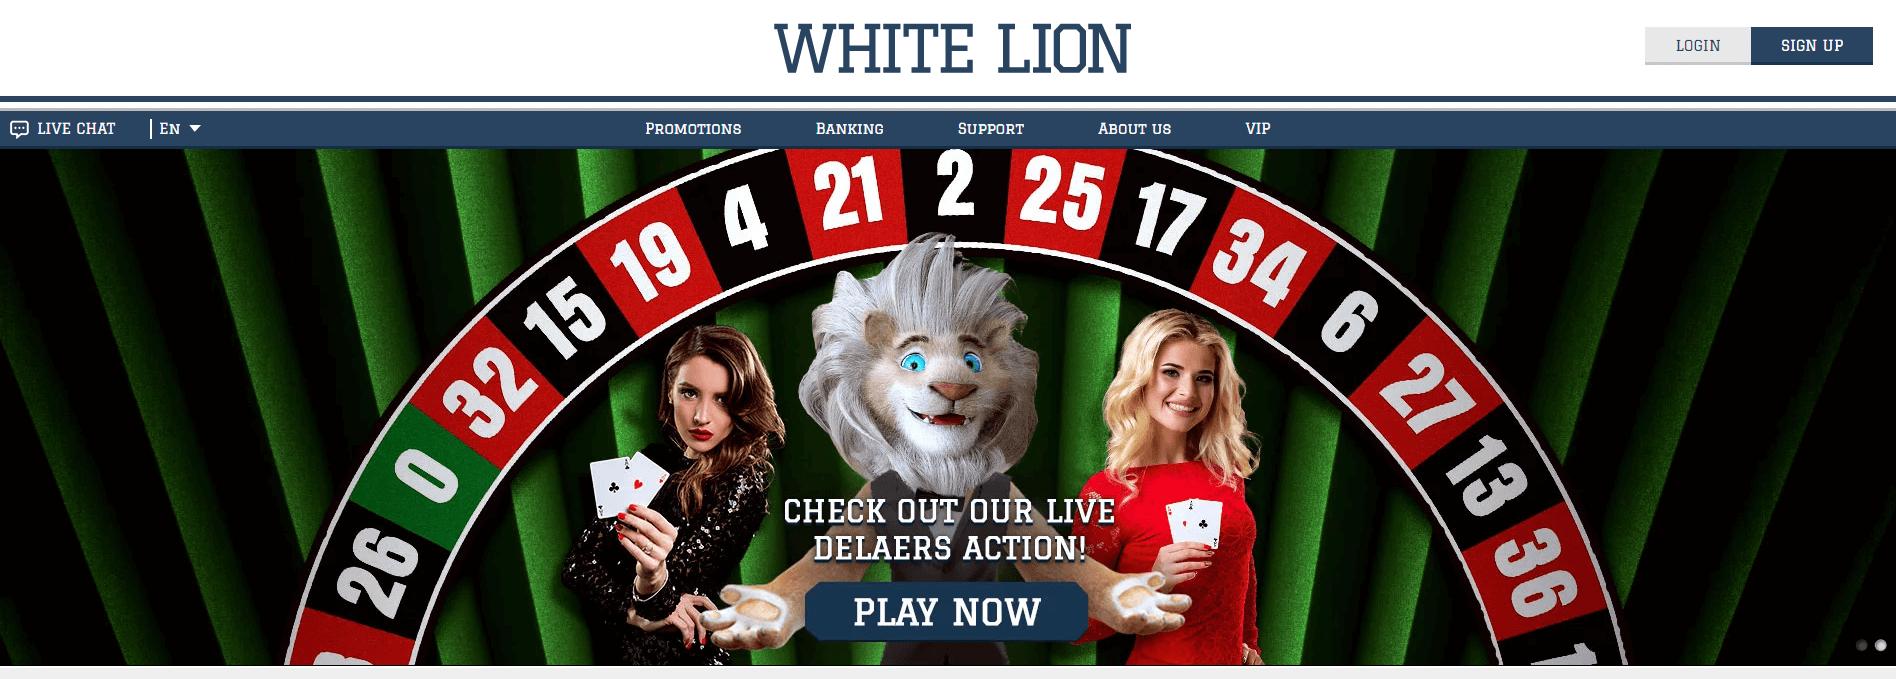 white lion casino login